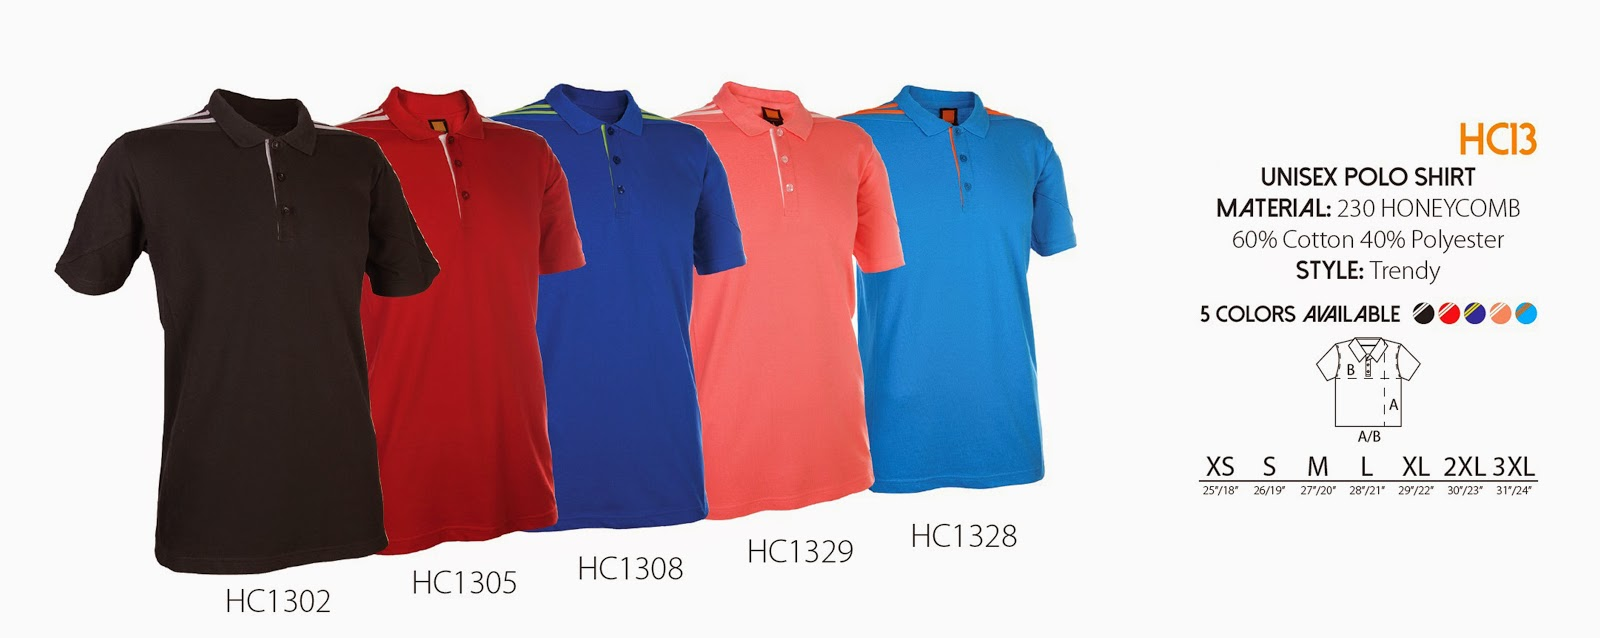 Design t shirt rumah sukan - 013 2850982 Zul Call Whatsapp